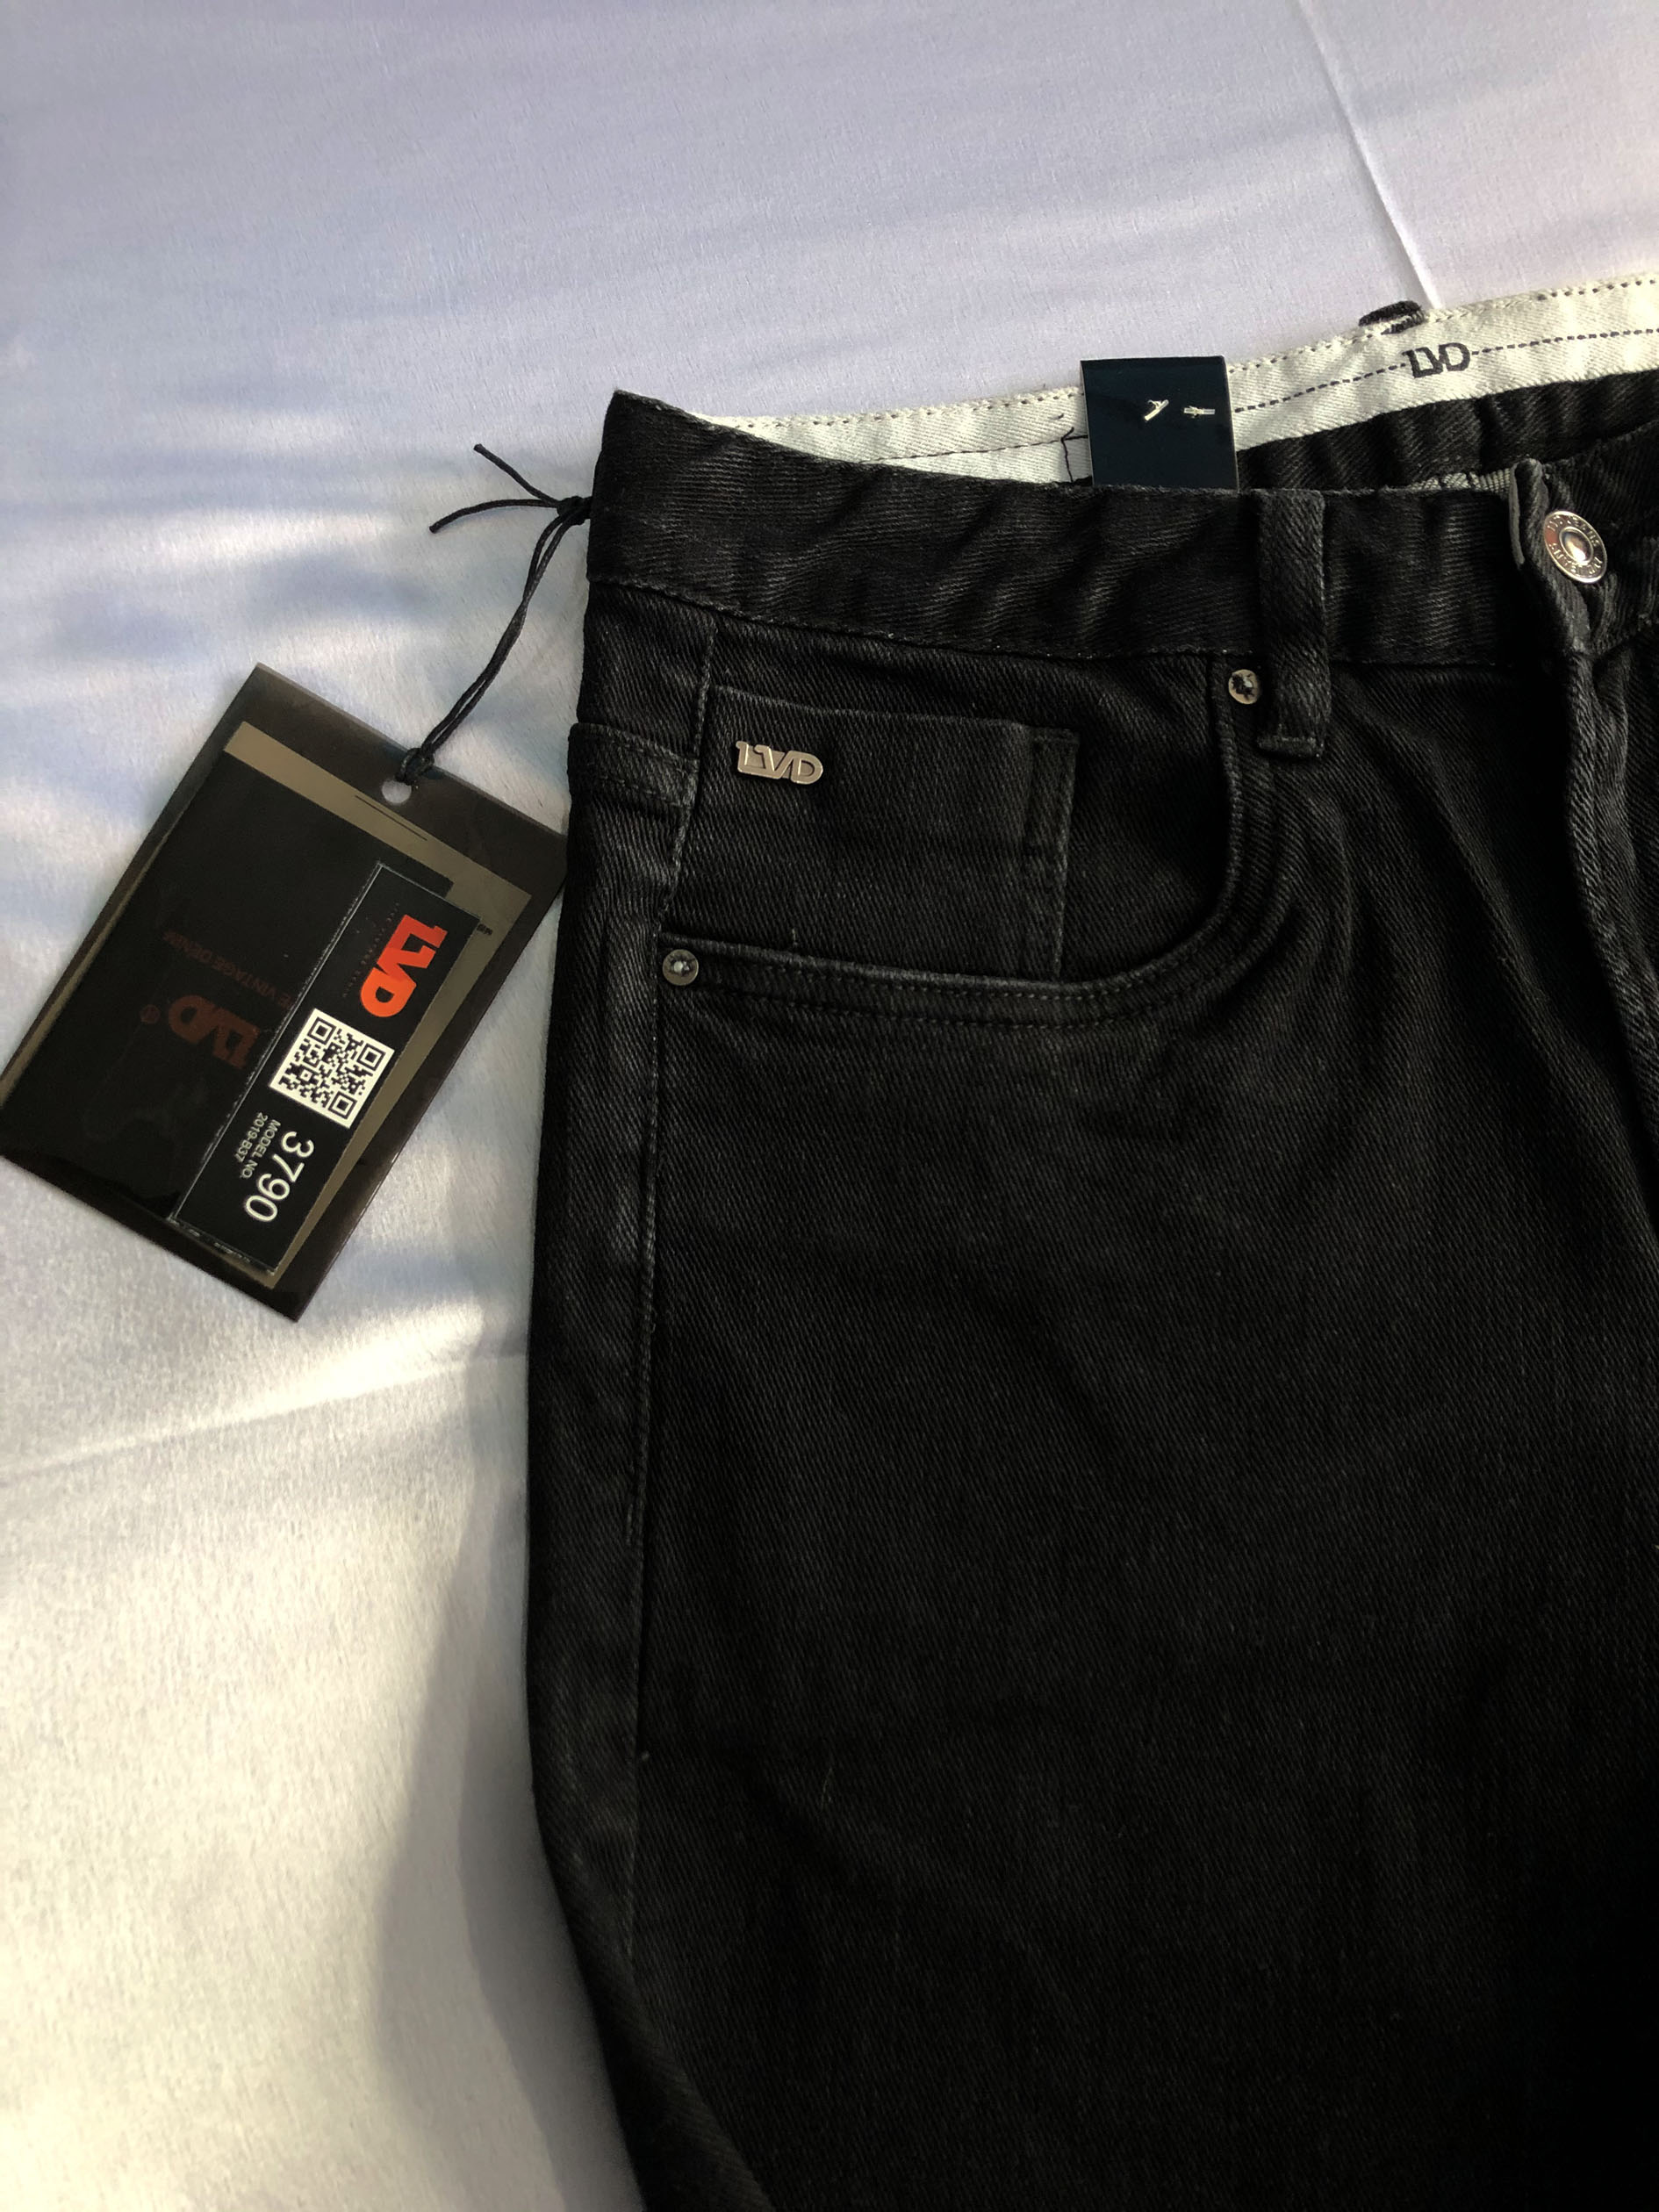 LVD Jeans Black